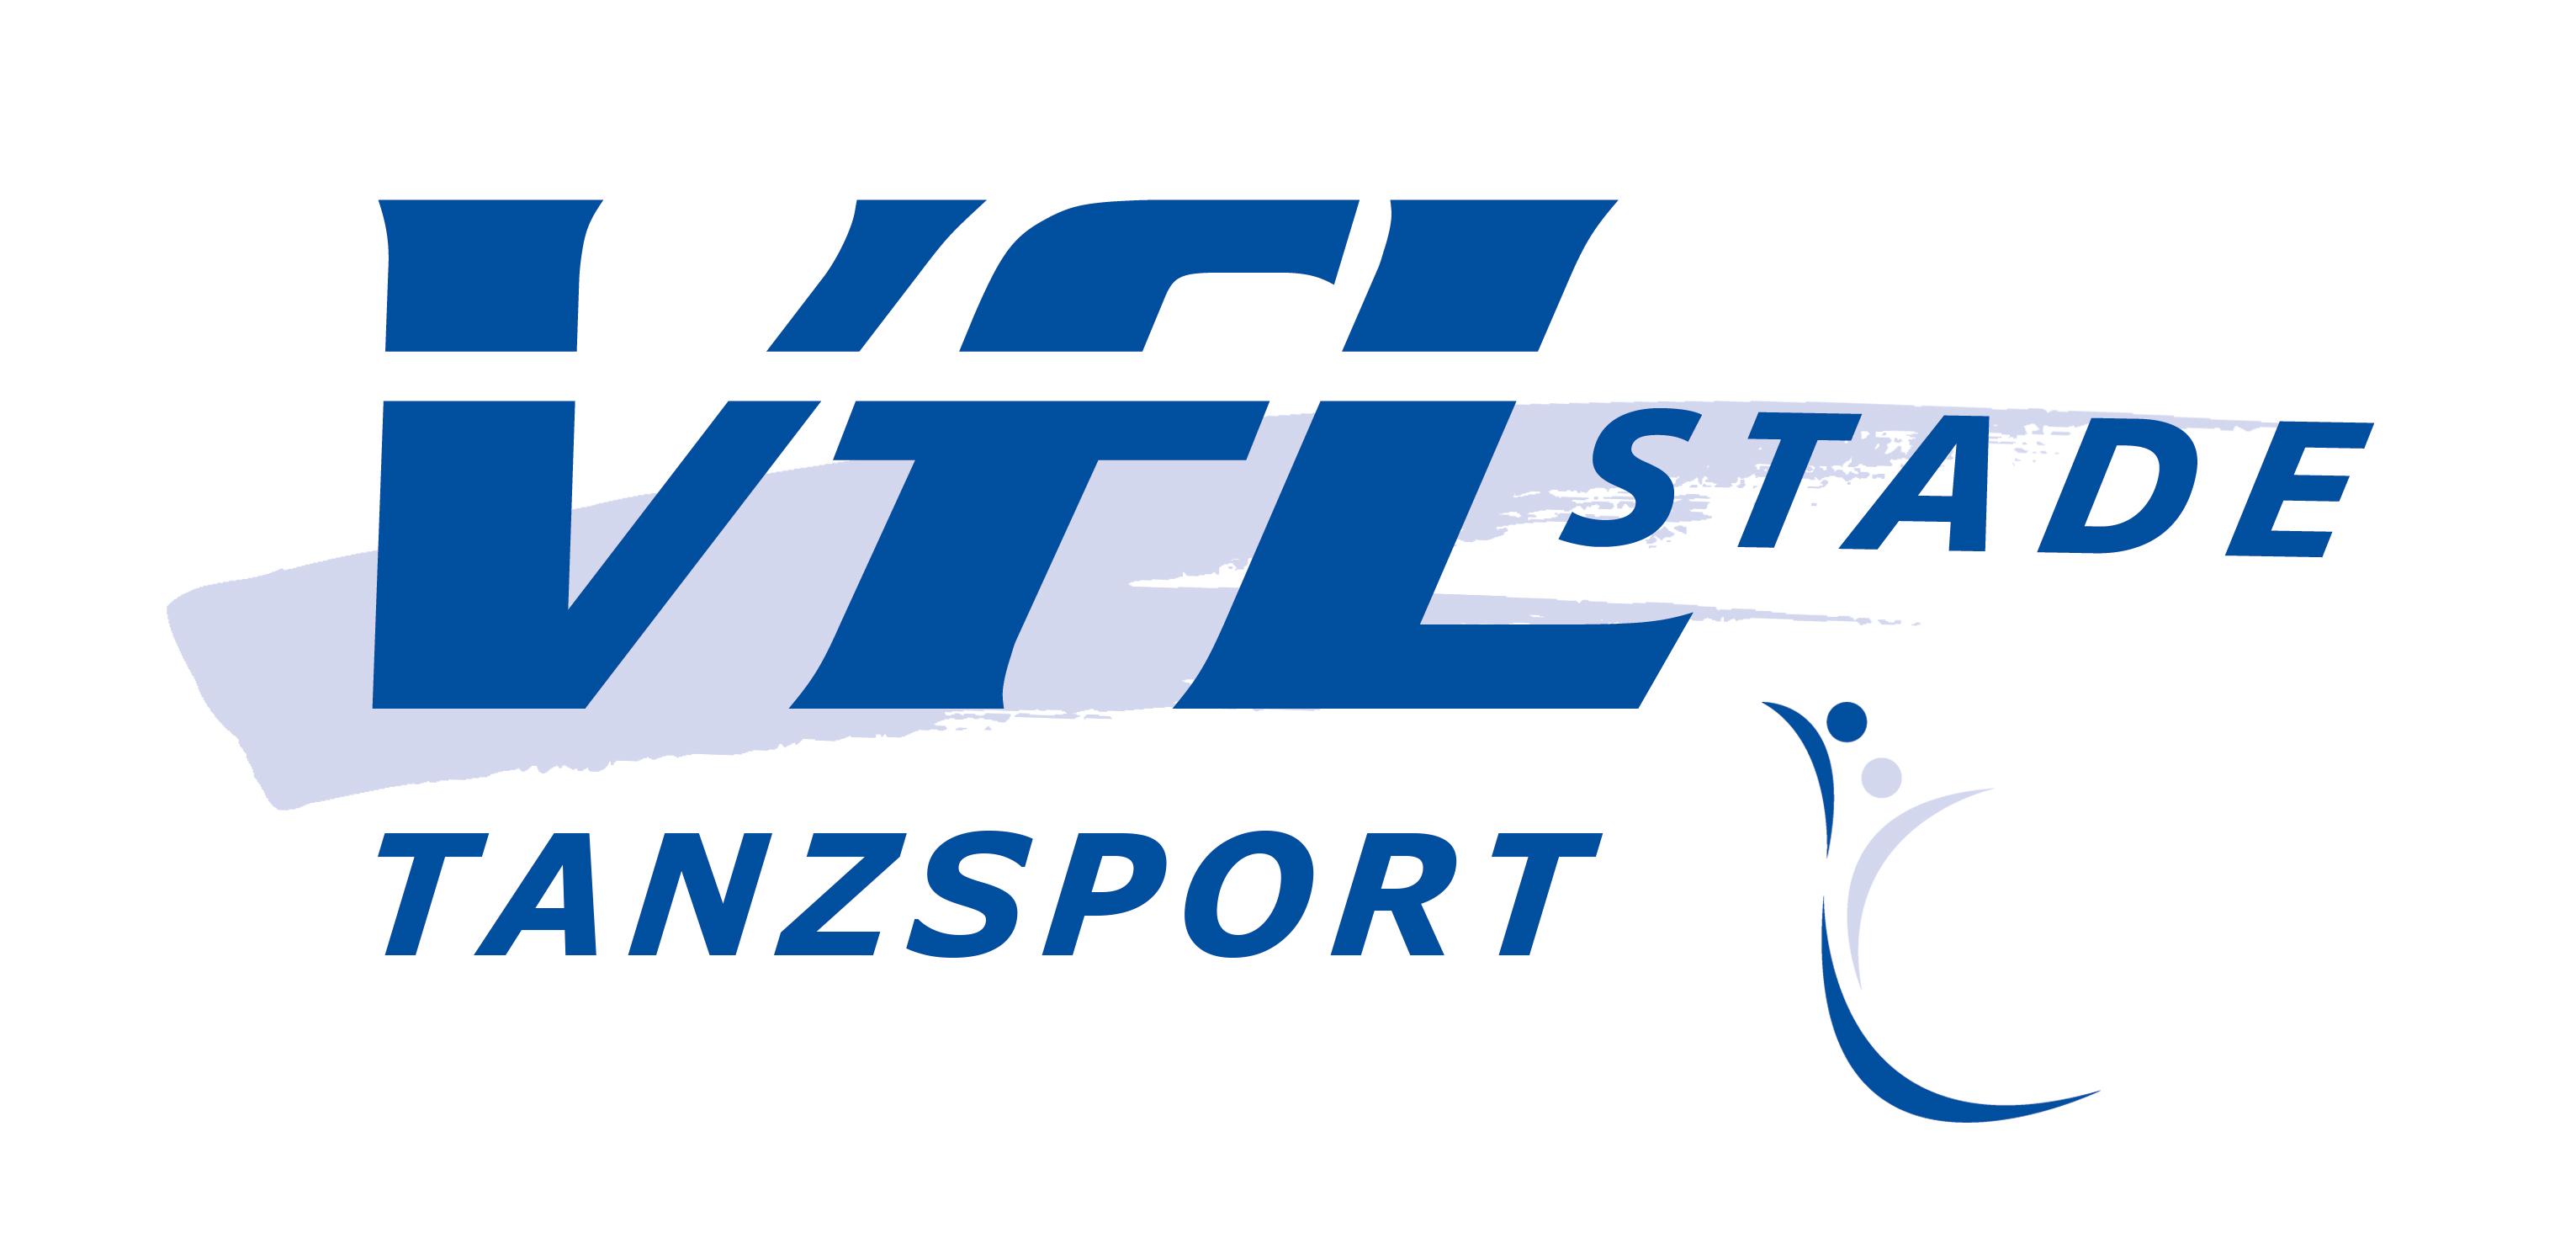 Abteilungslogos_VfL/Tanzsport_logo.jpg